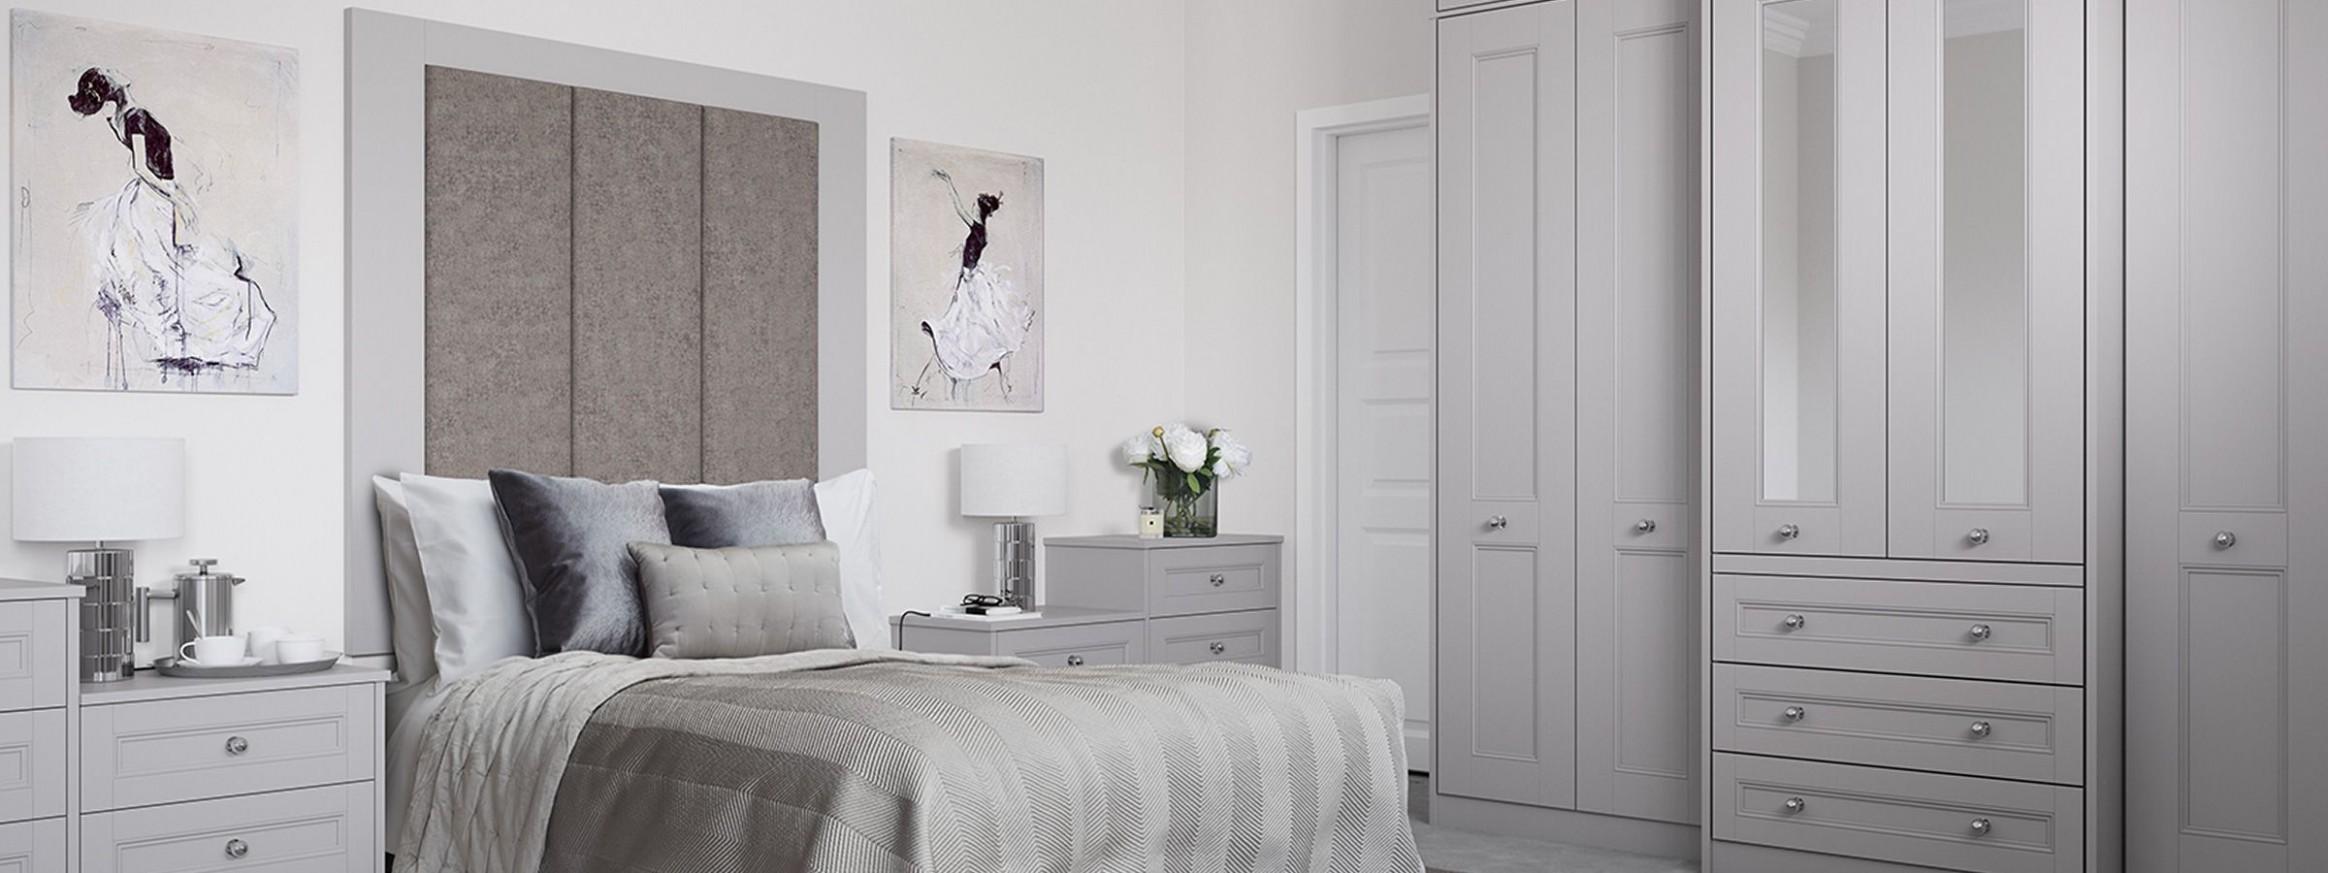 Fitted Bedroom Service - Bedroom Ideas John Lewis